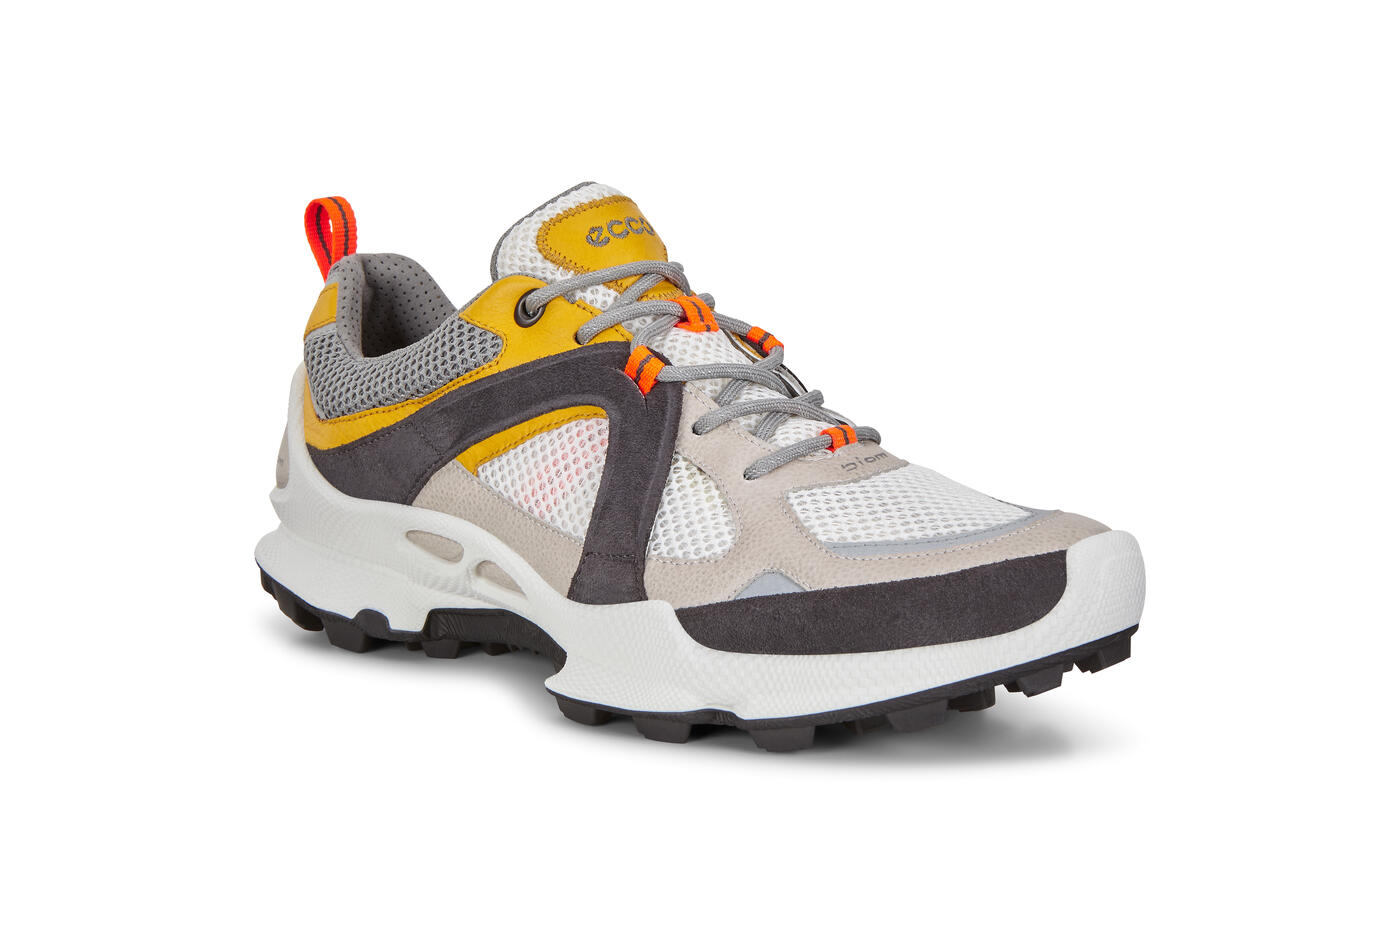 Chaussure ECCO Biom C-Trail basse pour hommes